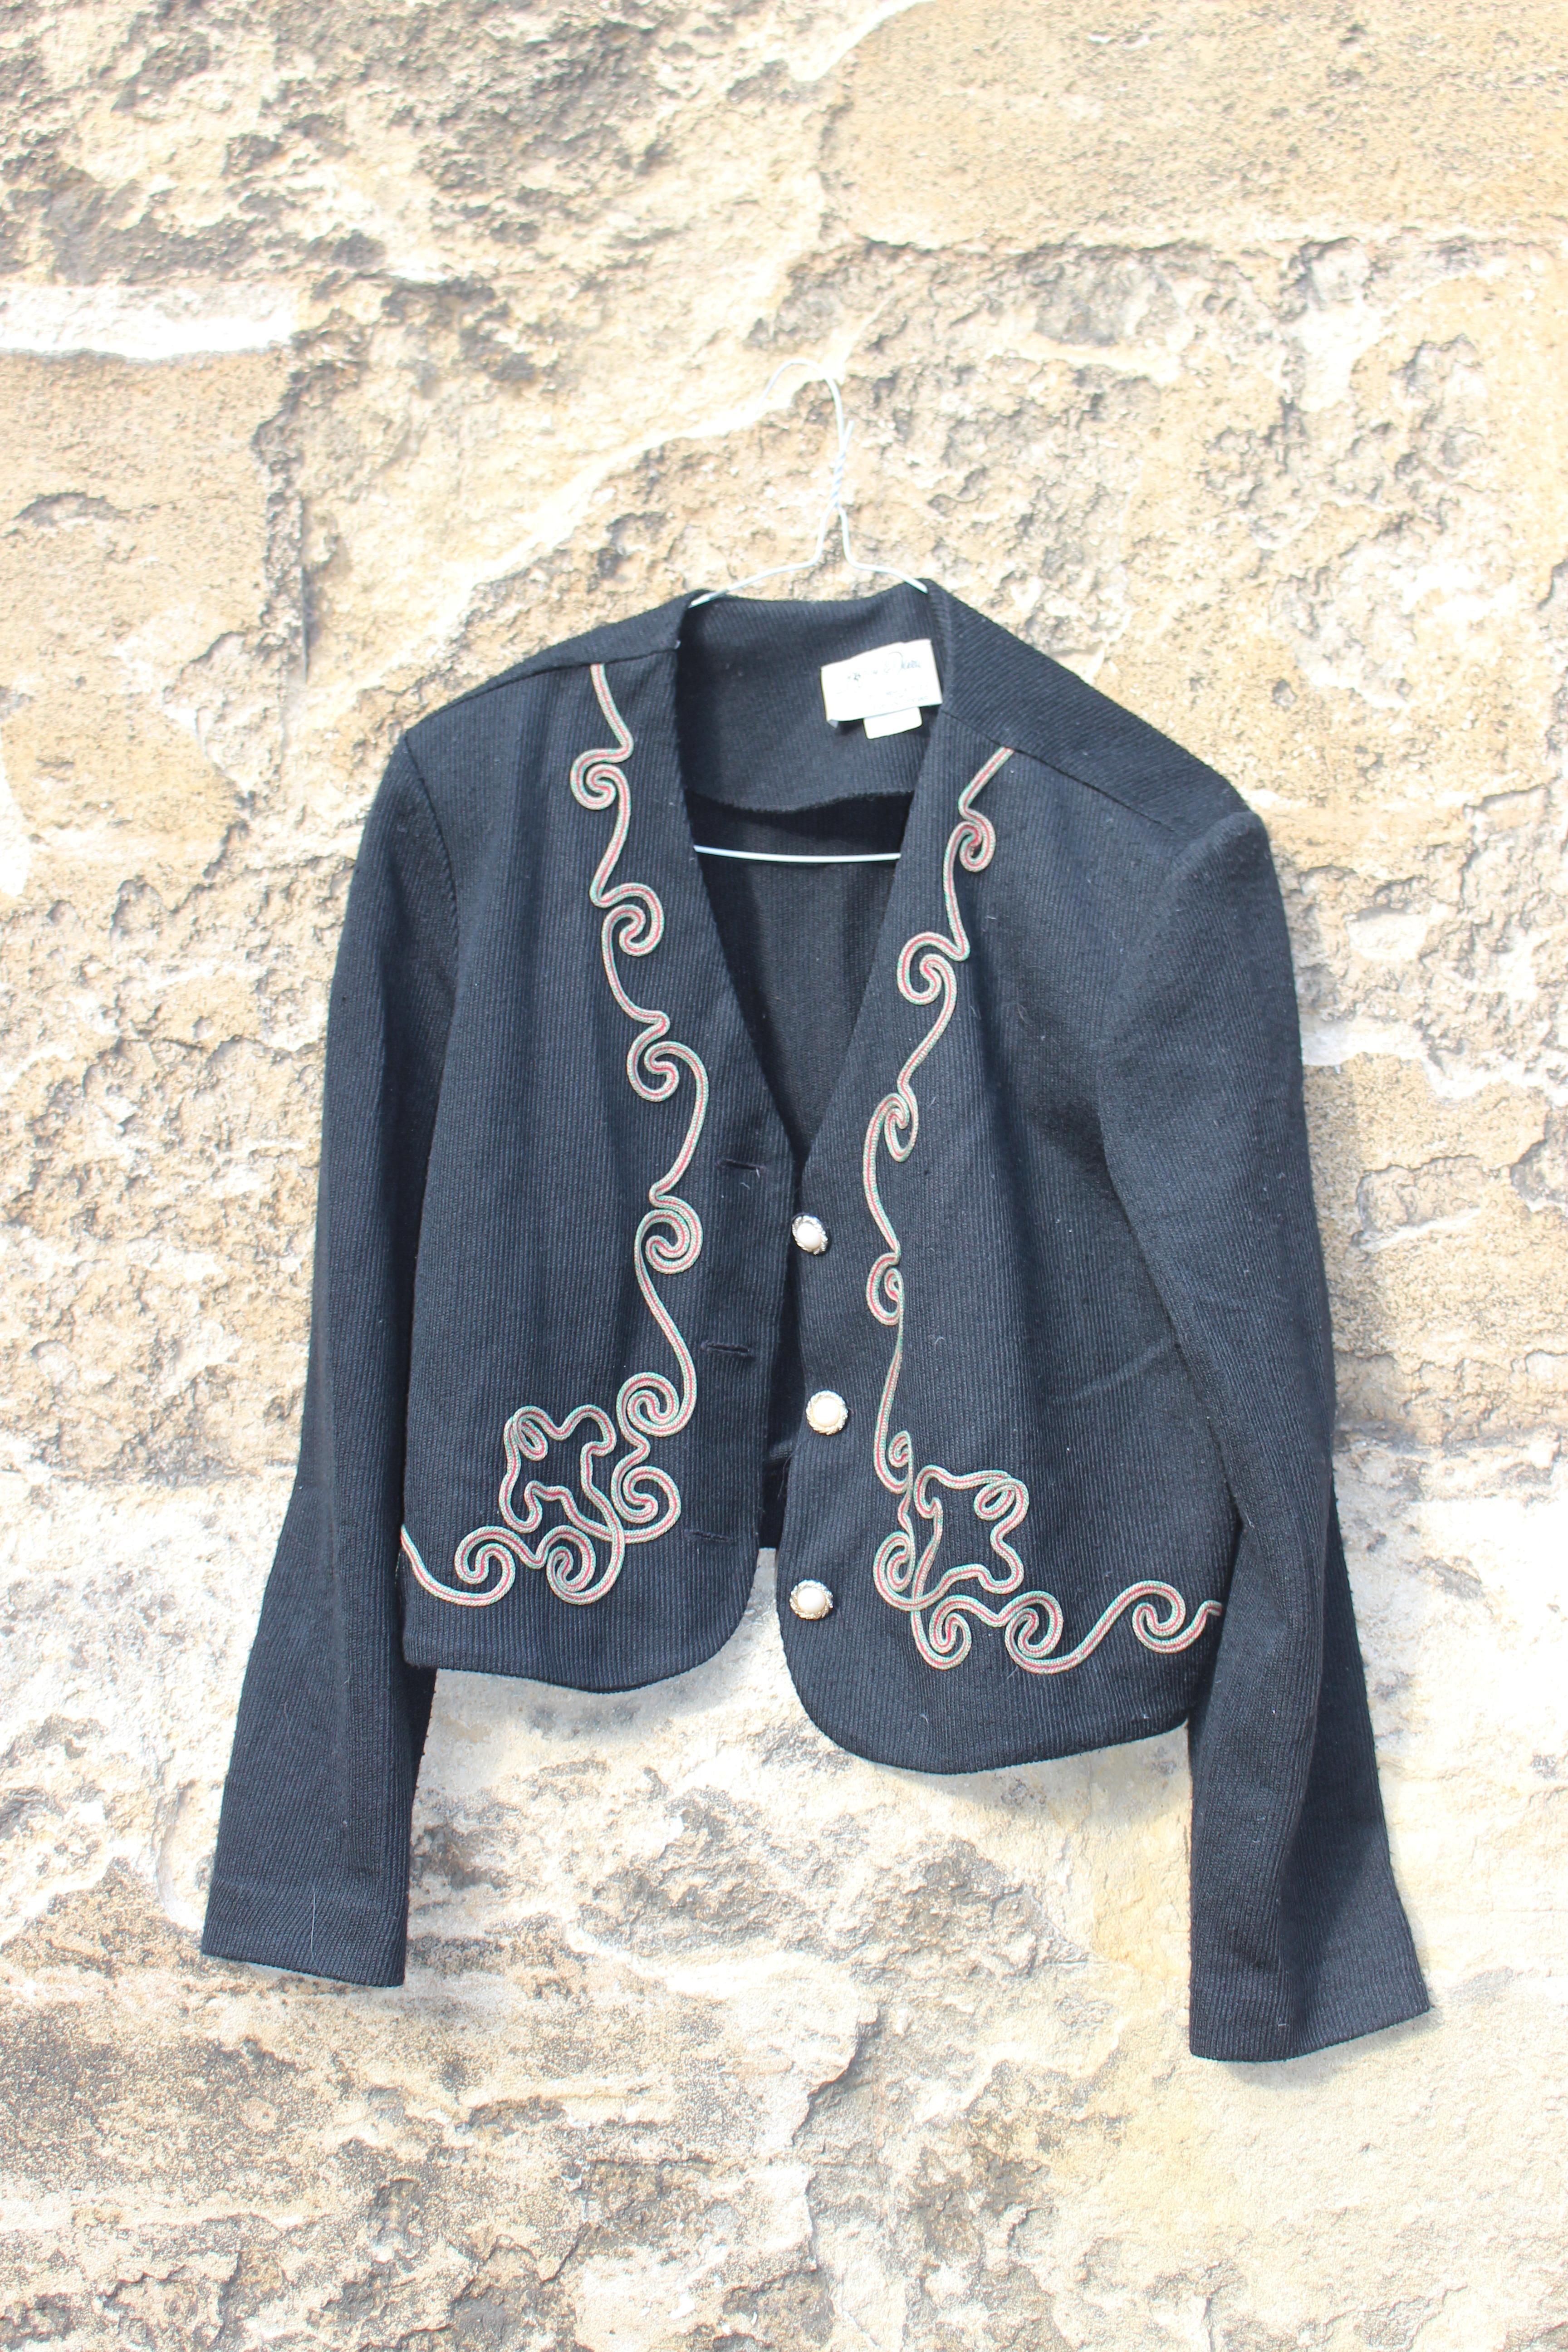 Jeffrey & Dara black braided top, from Unicorn, 5 Ship Street, Oxford